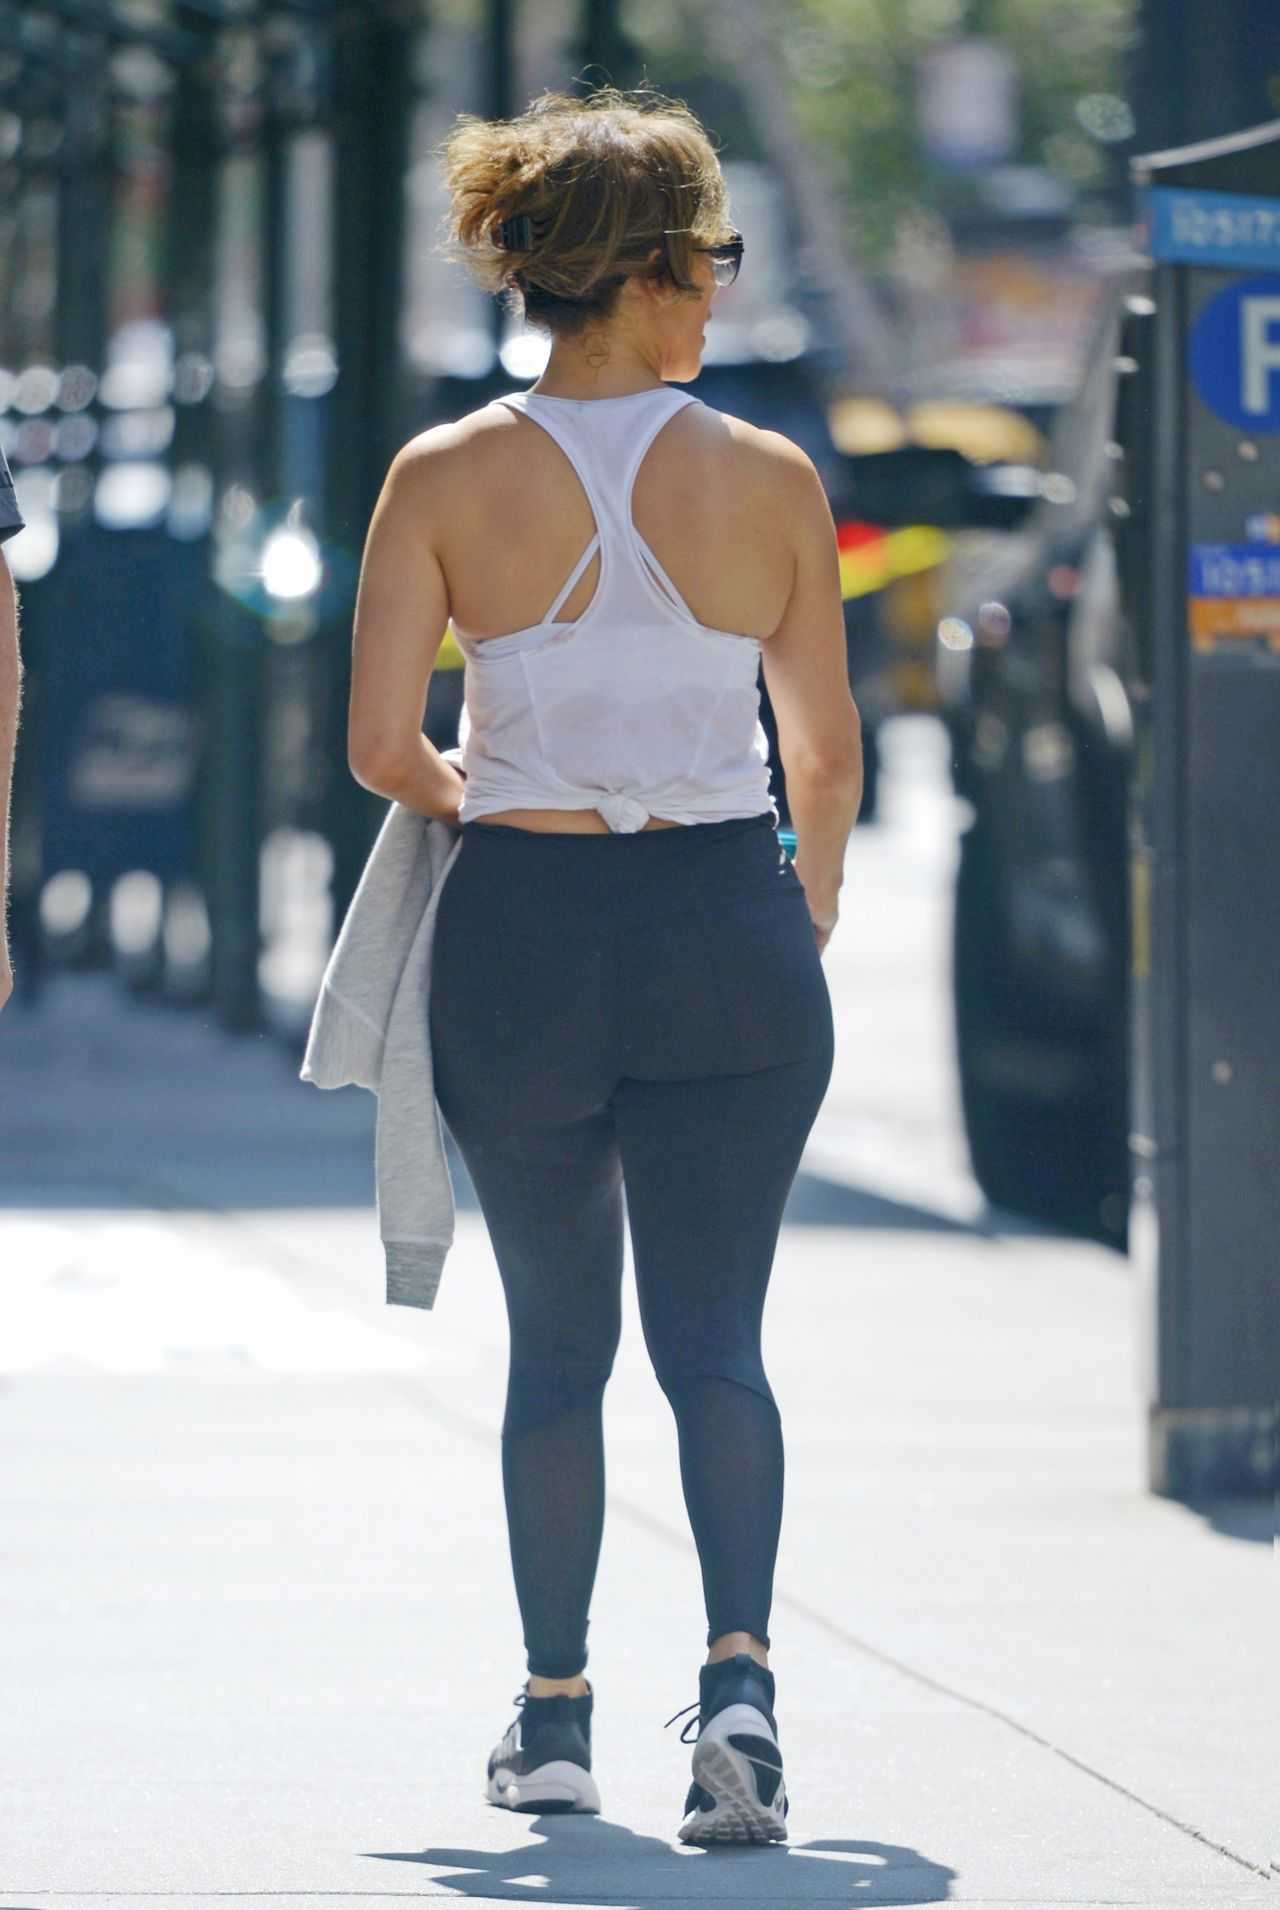 Will know, Jennifer lopez butt much